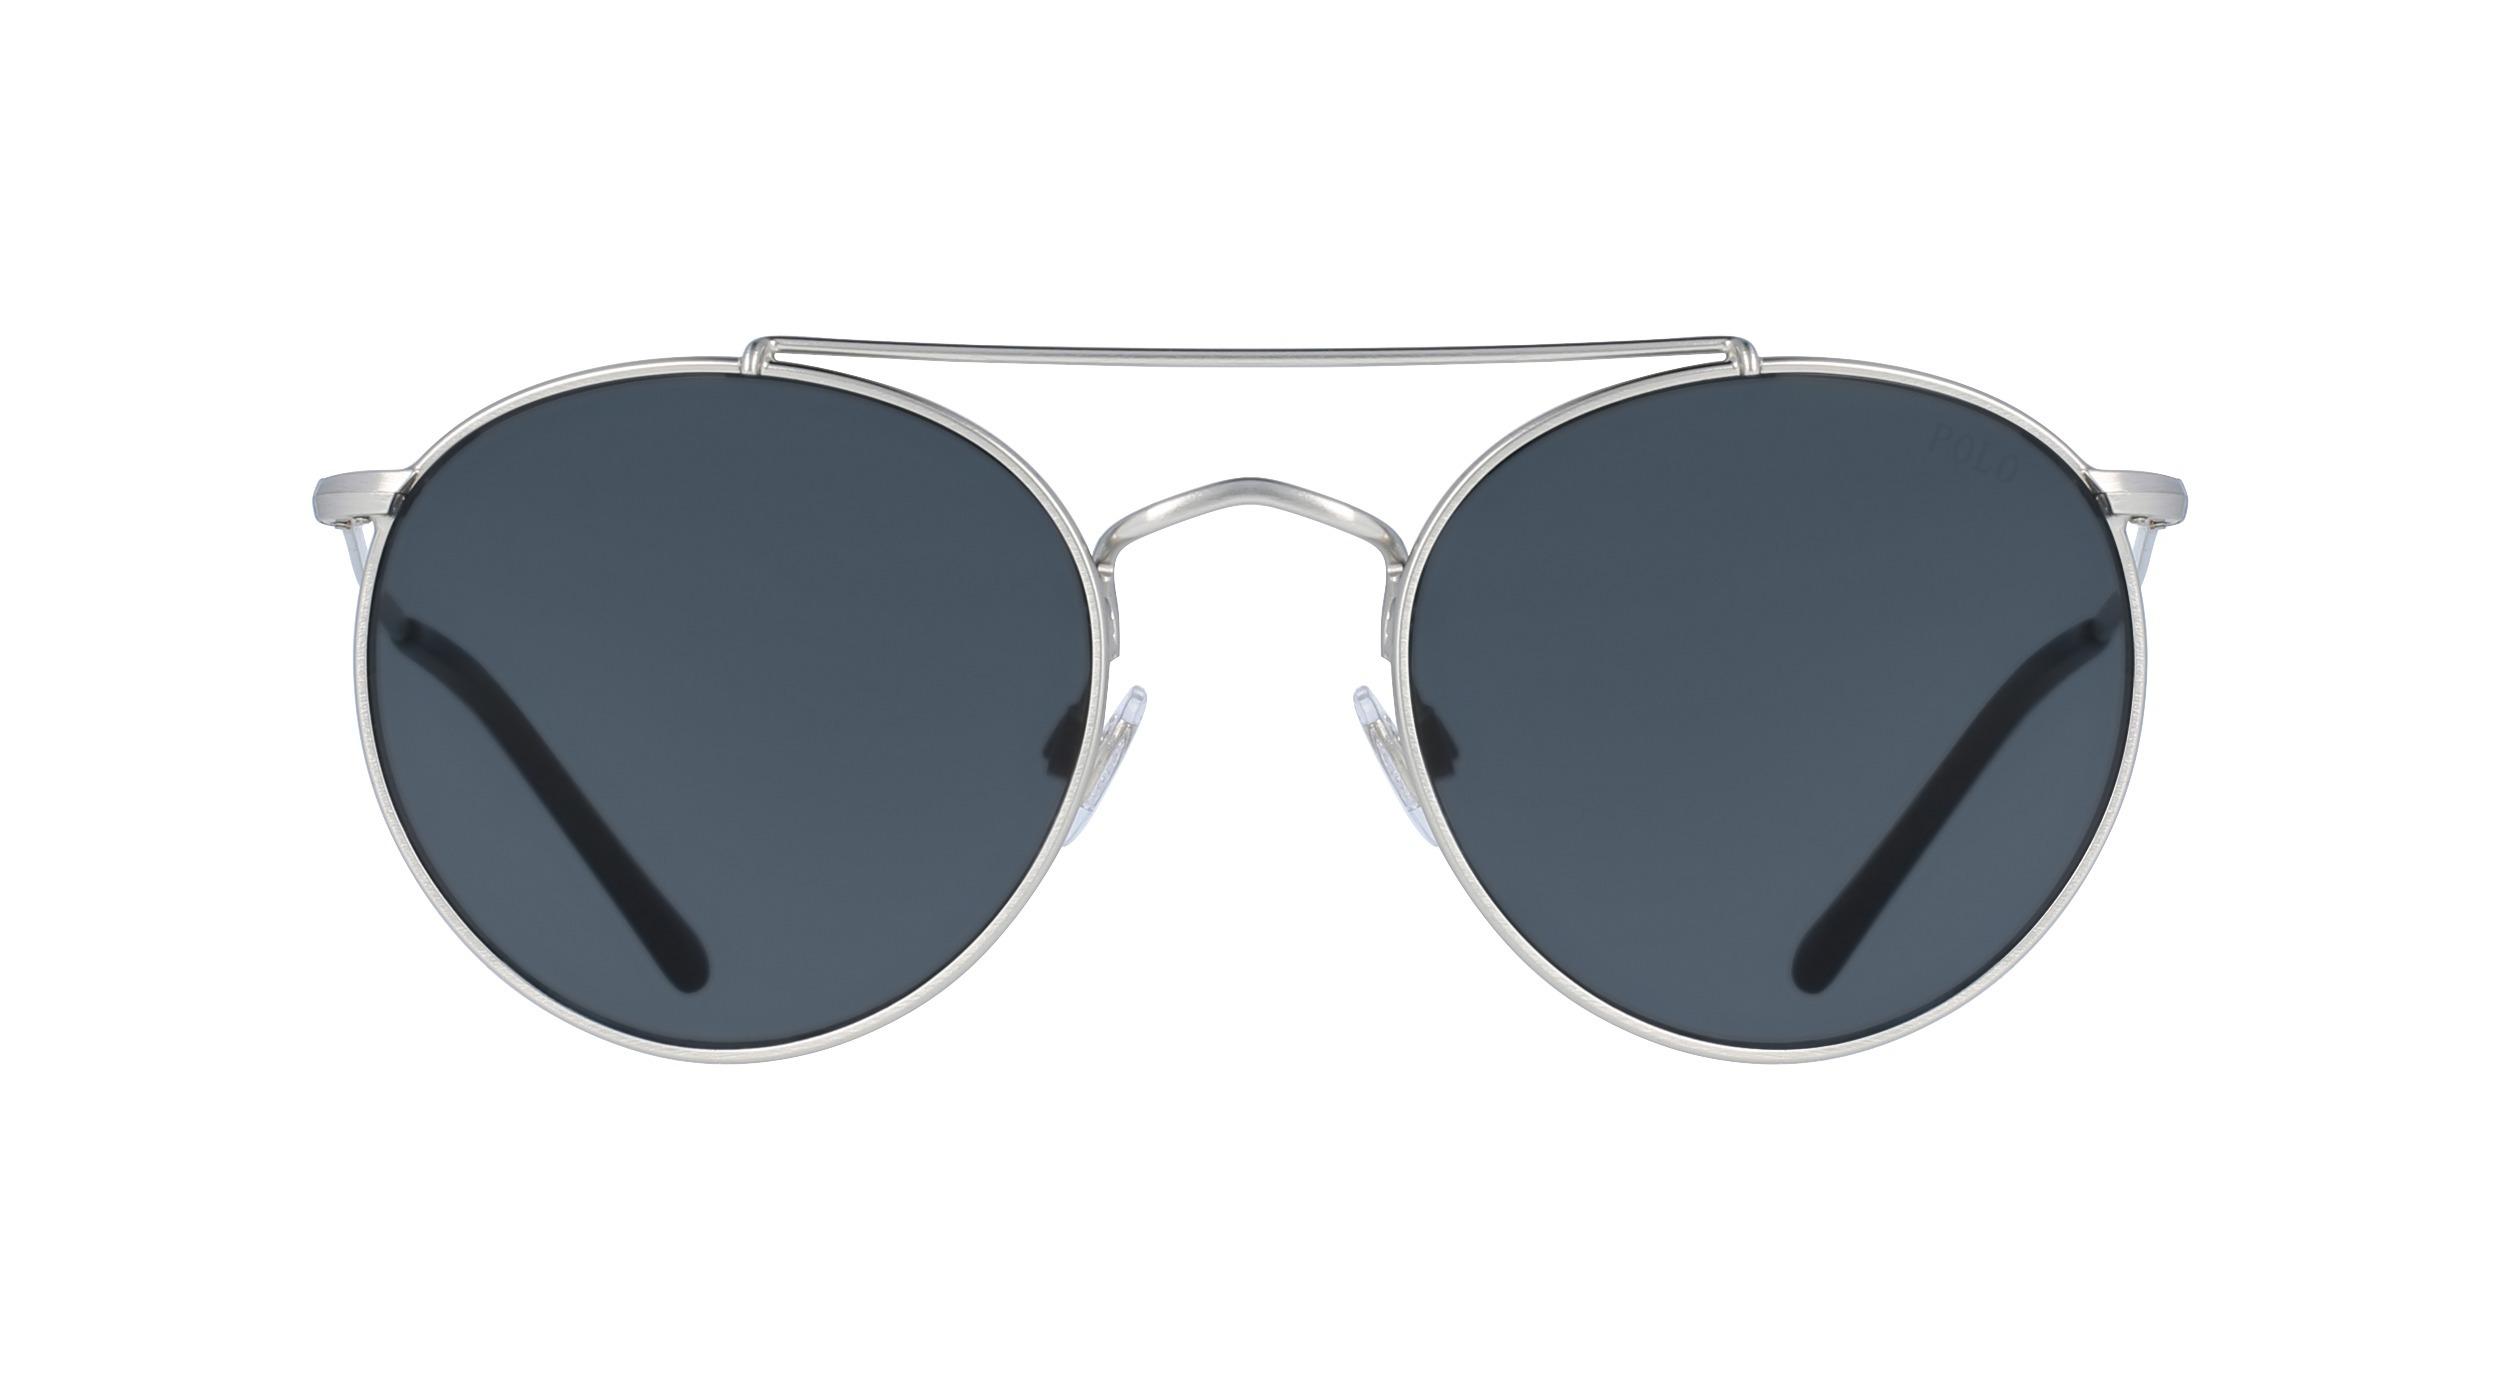 optic2000-lunettes-soleil-ralph-lauren